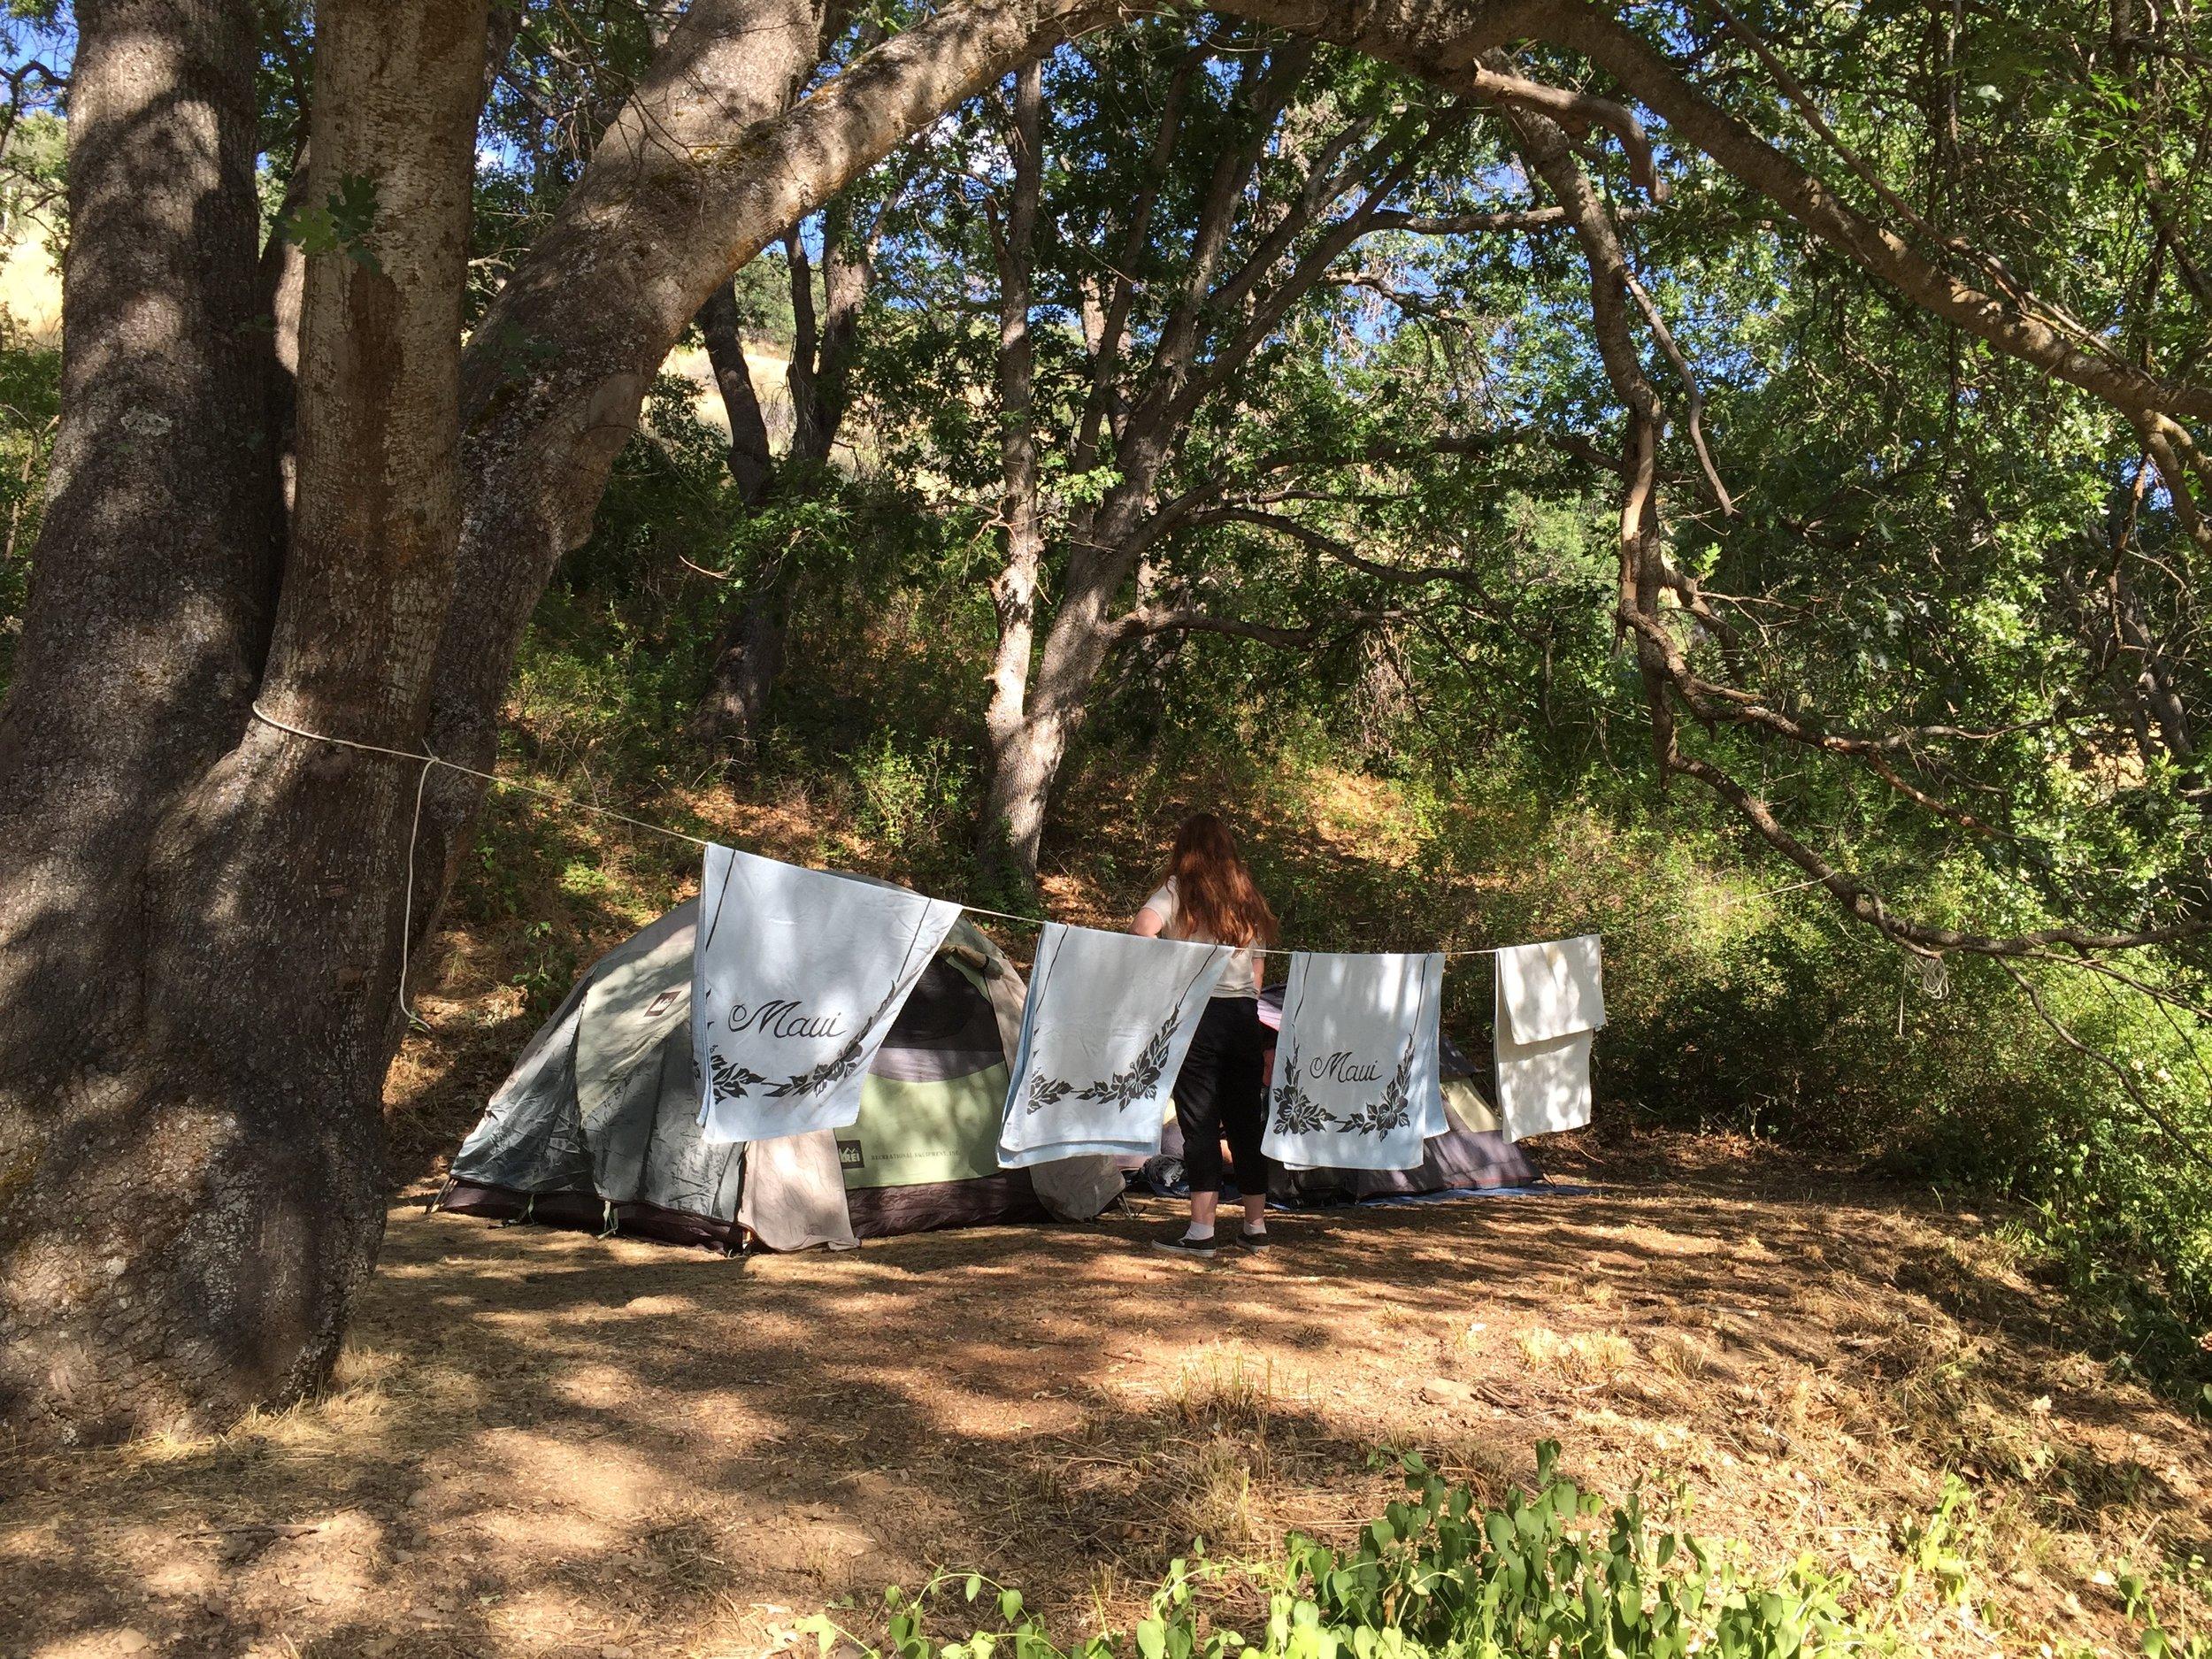 Campsite under the oaks